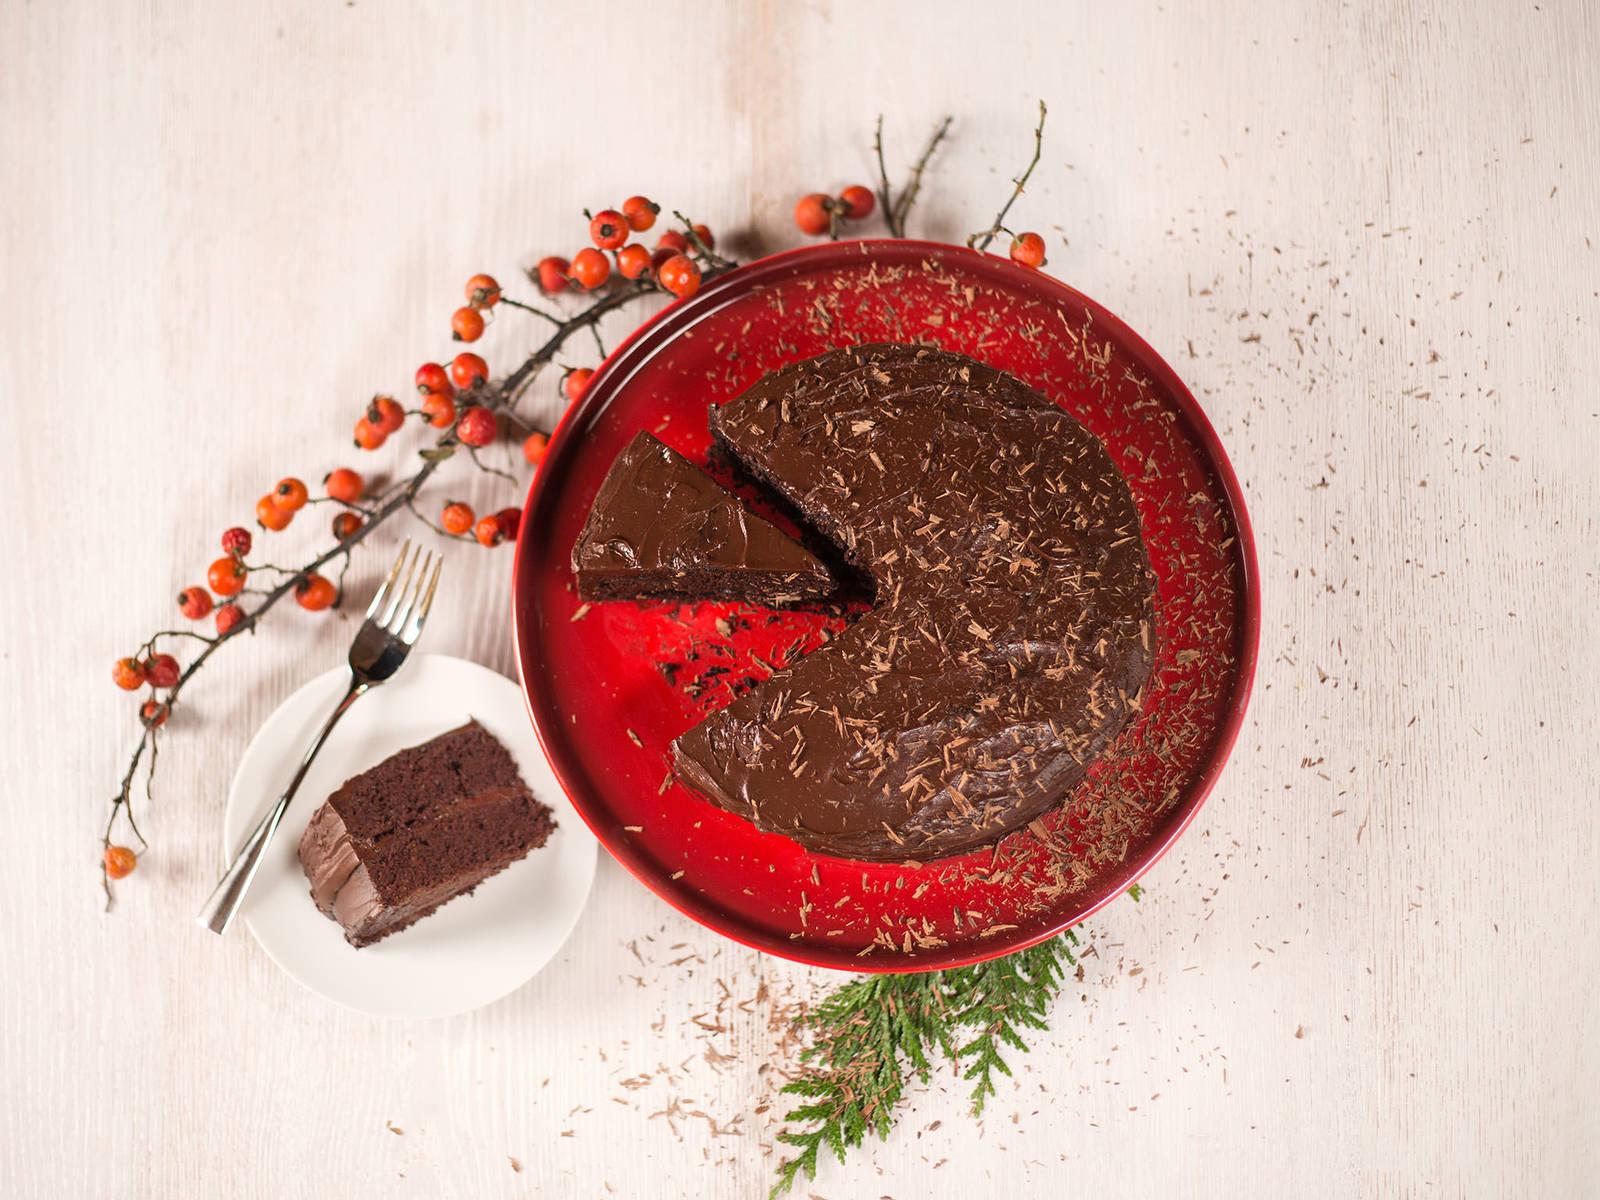 The Kitchen Devils Food Cake